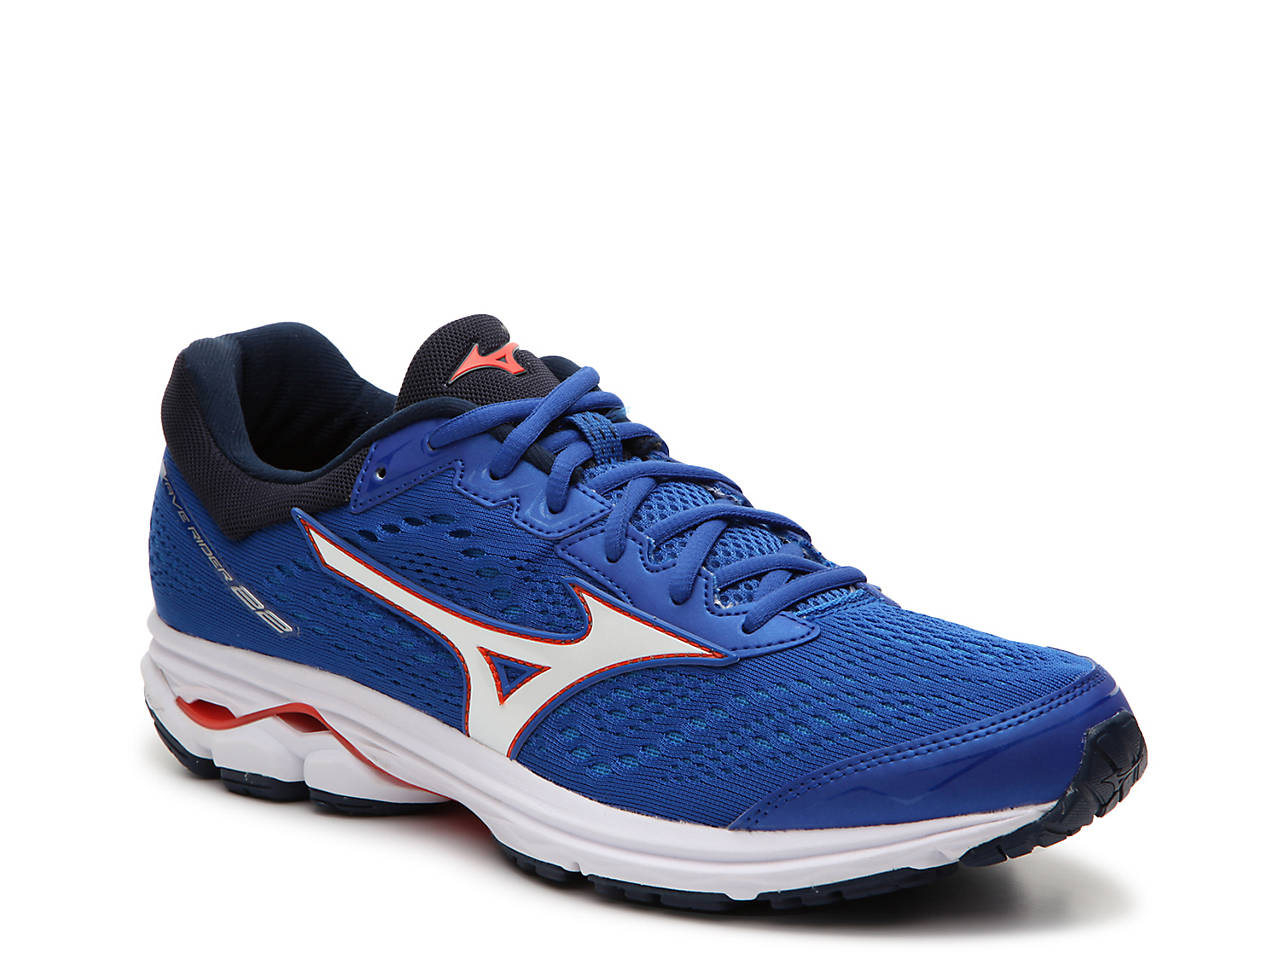 0c1a04b998 Mizuno Wave Rider 22 Performance Running Shoe - Men's Men's Shoes | DSW